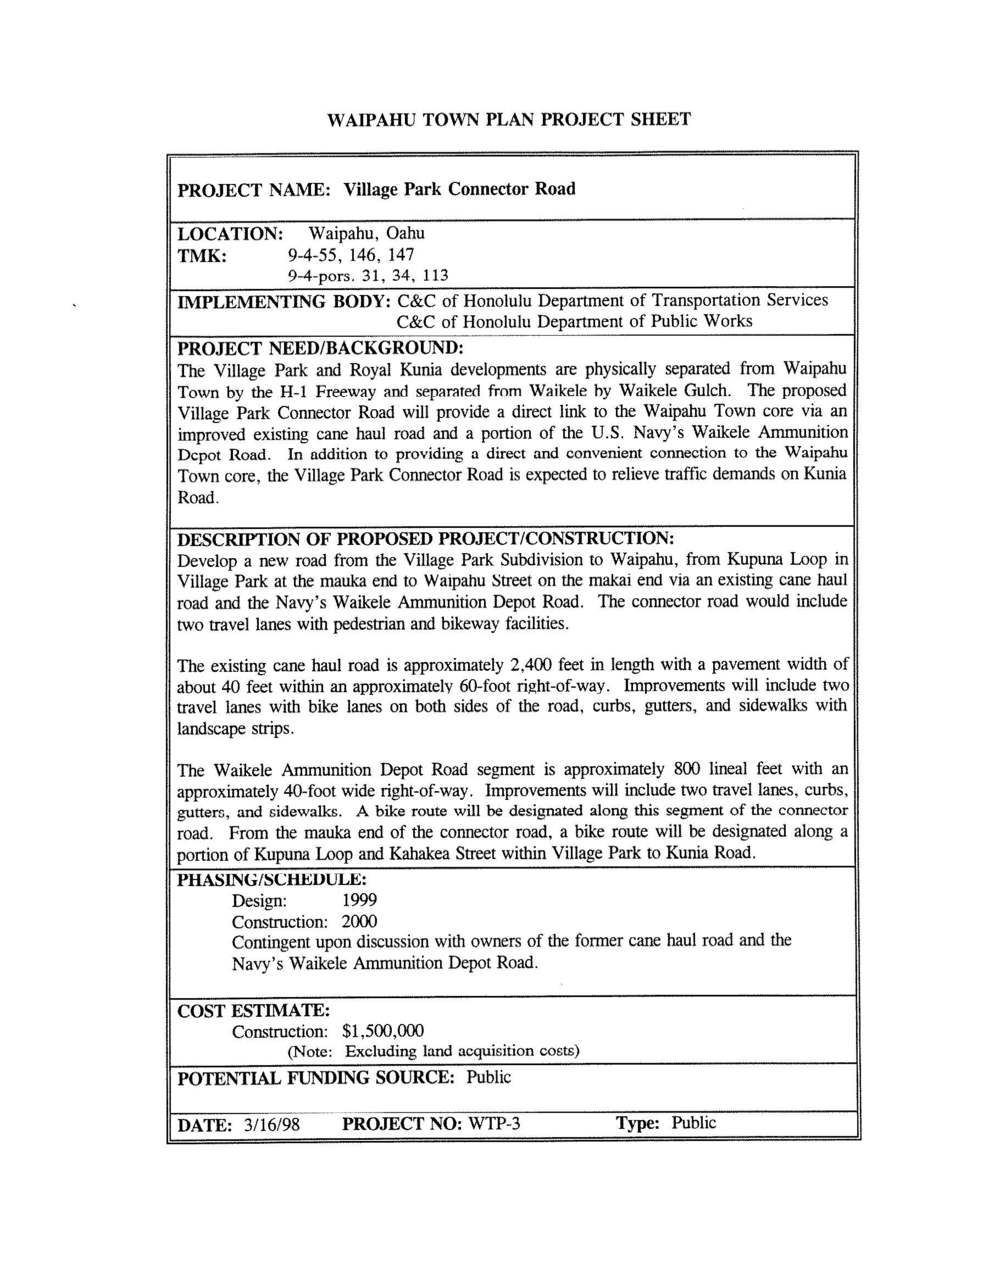 160531_WaipahuLivableCommunities(1998)_Page_139.jpg